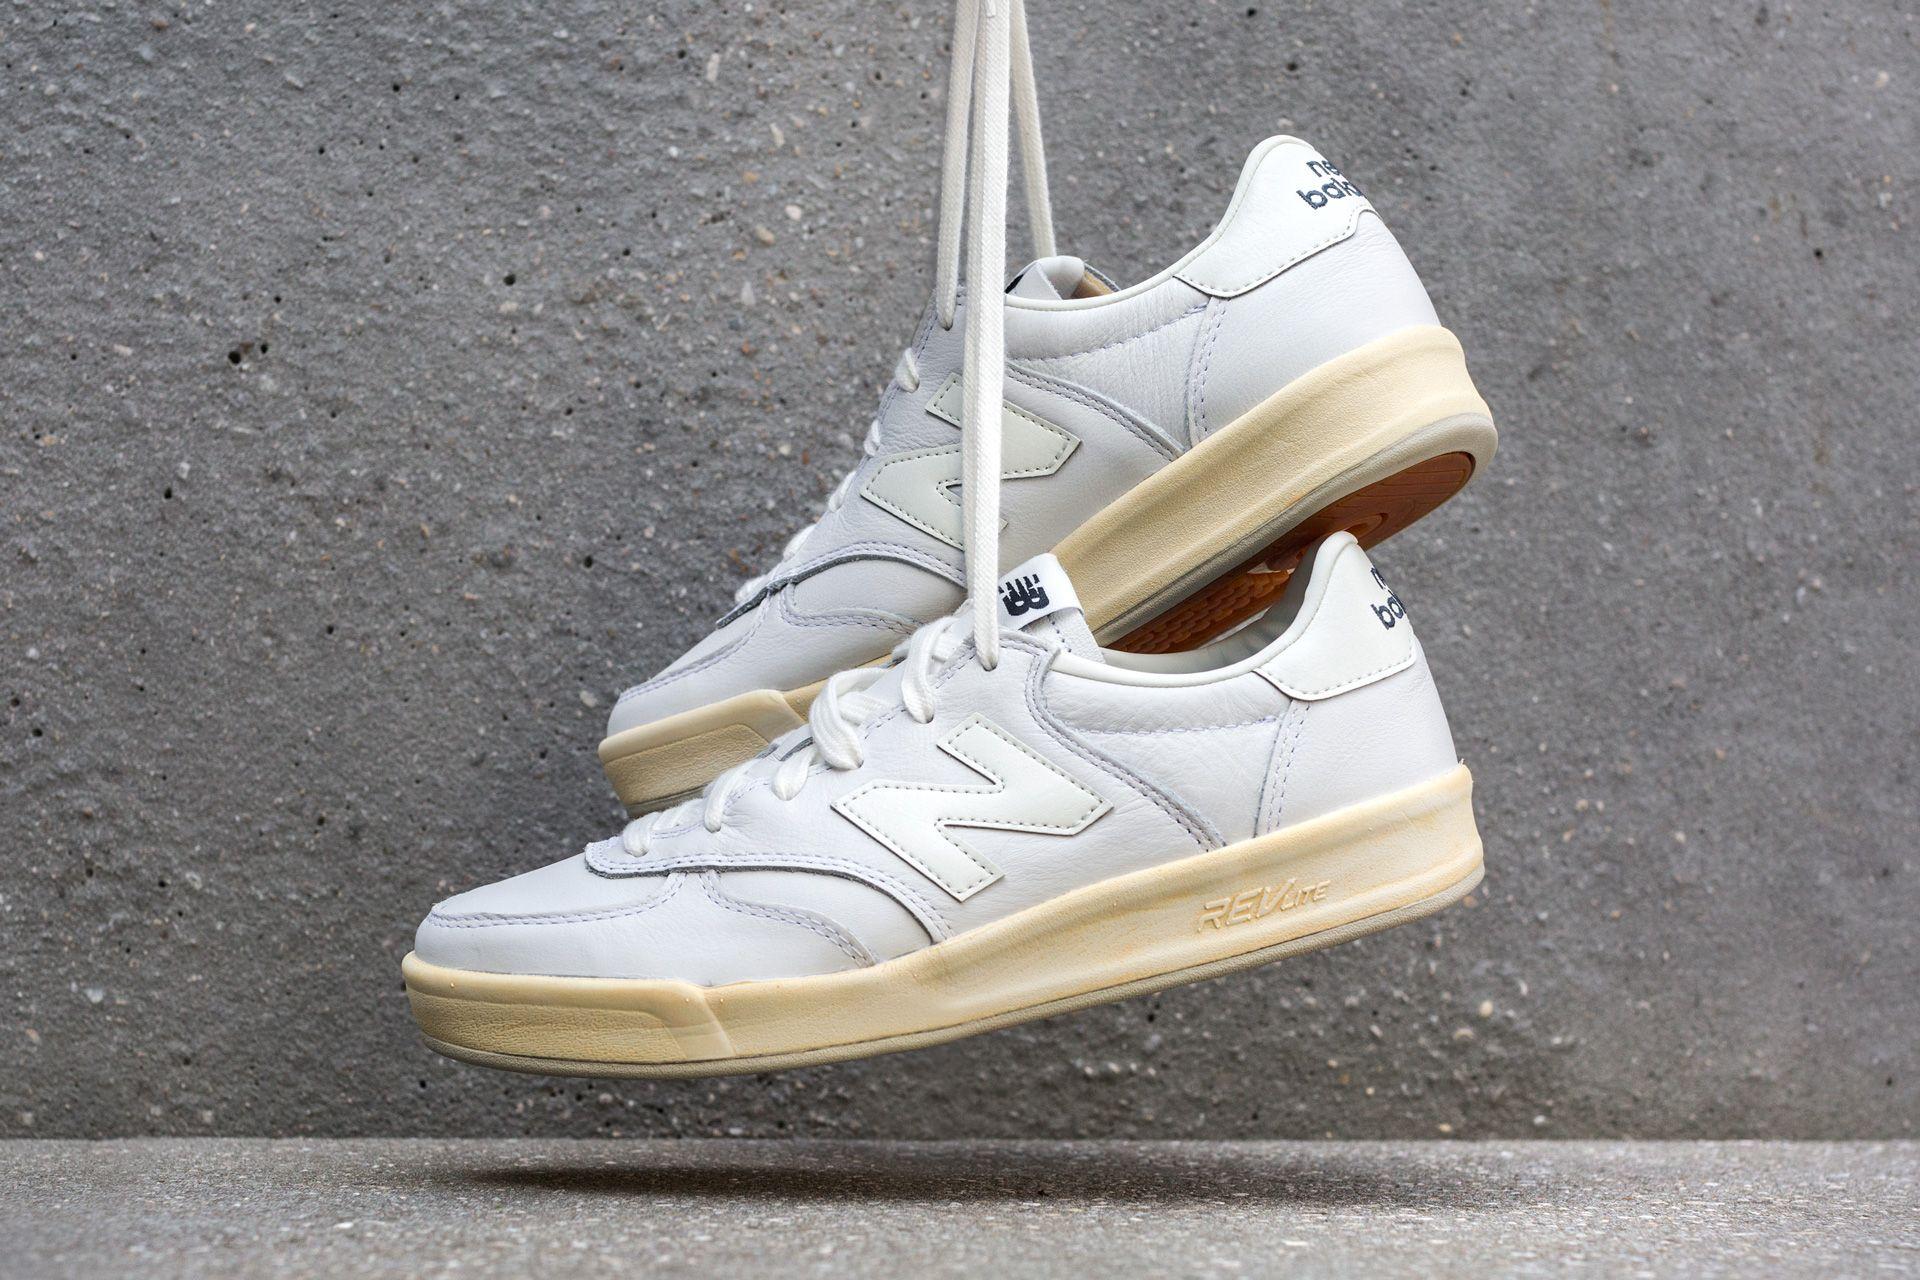 New Balance CRT300 CL | Freizeitkleidung, Sneaker ...